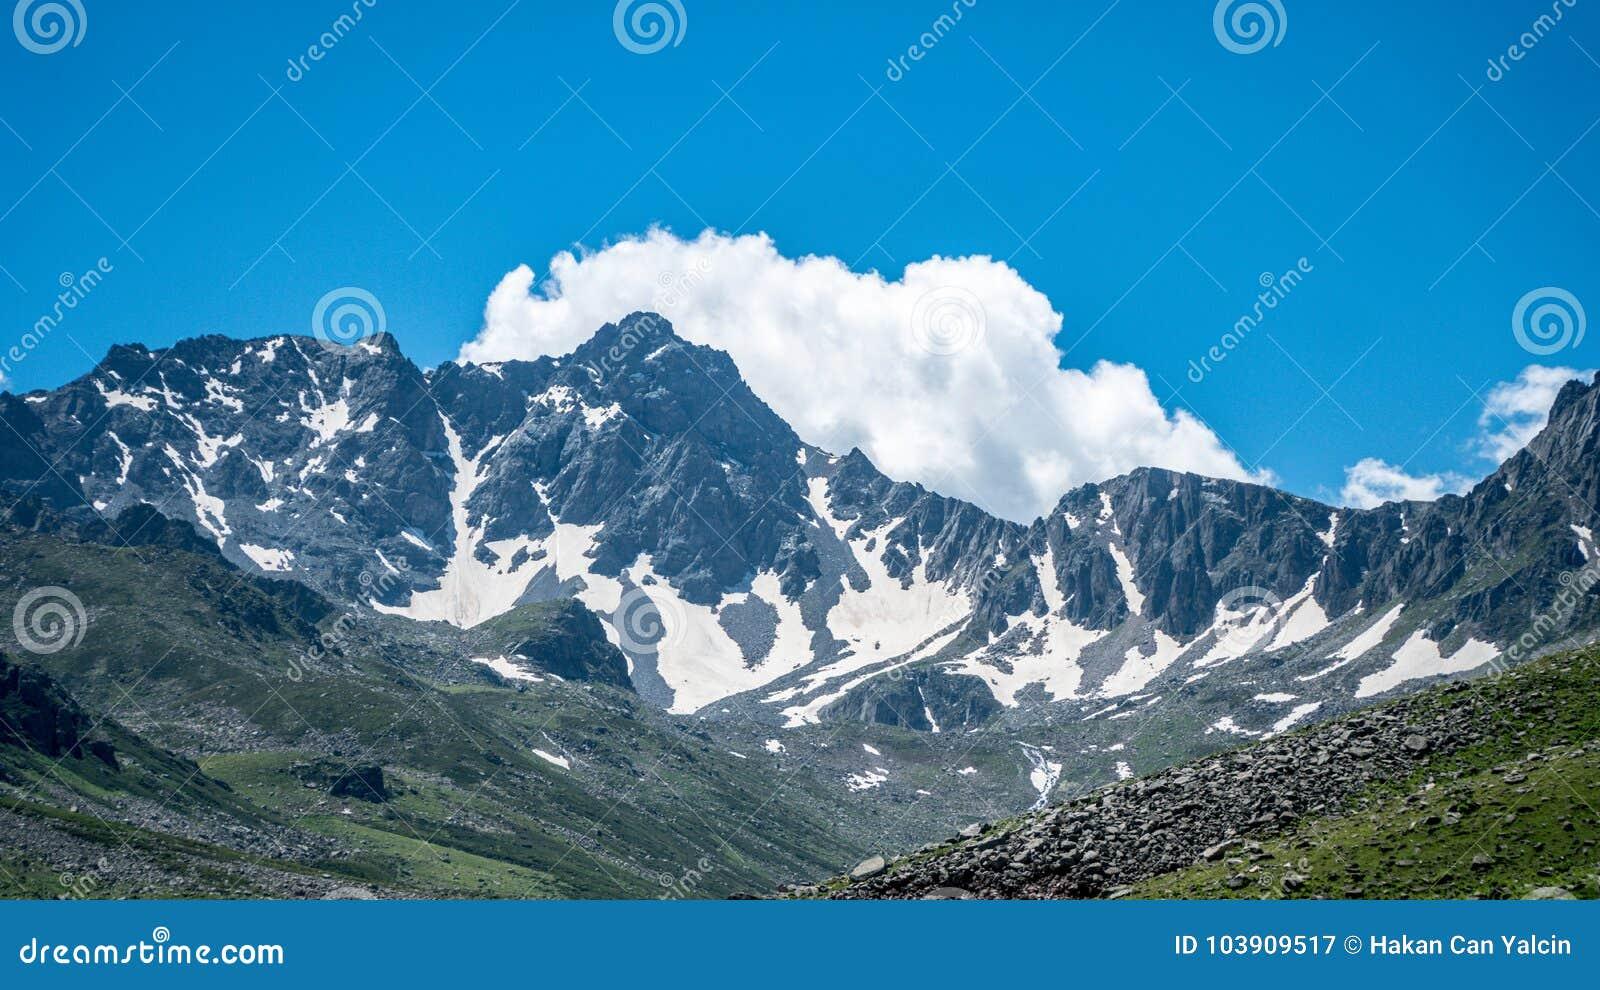 Montagnes de Kackar dans la région de la Mer Noire Karadeniz, Turquie